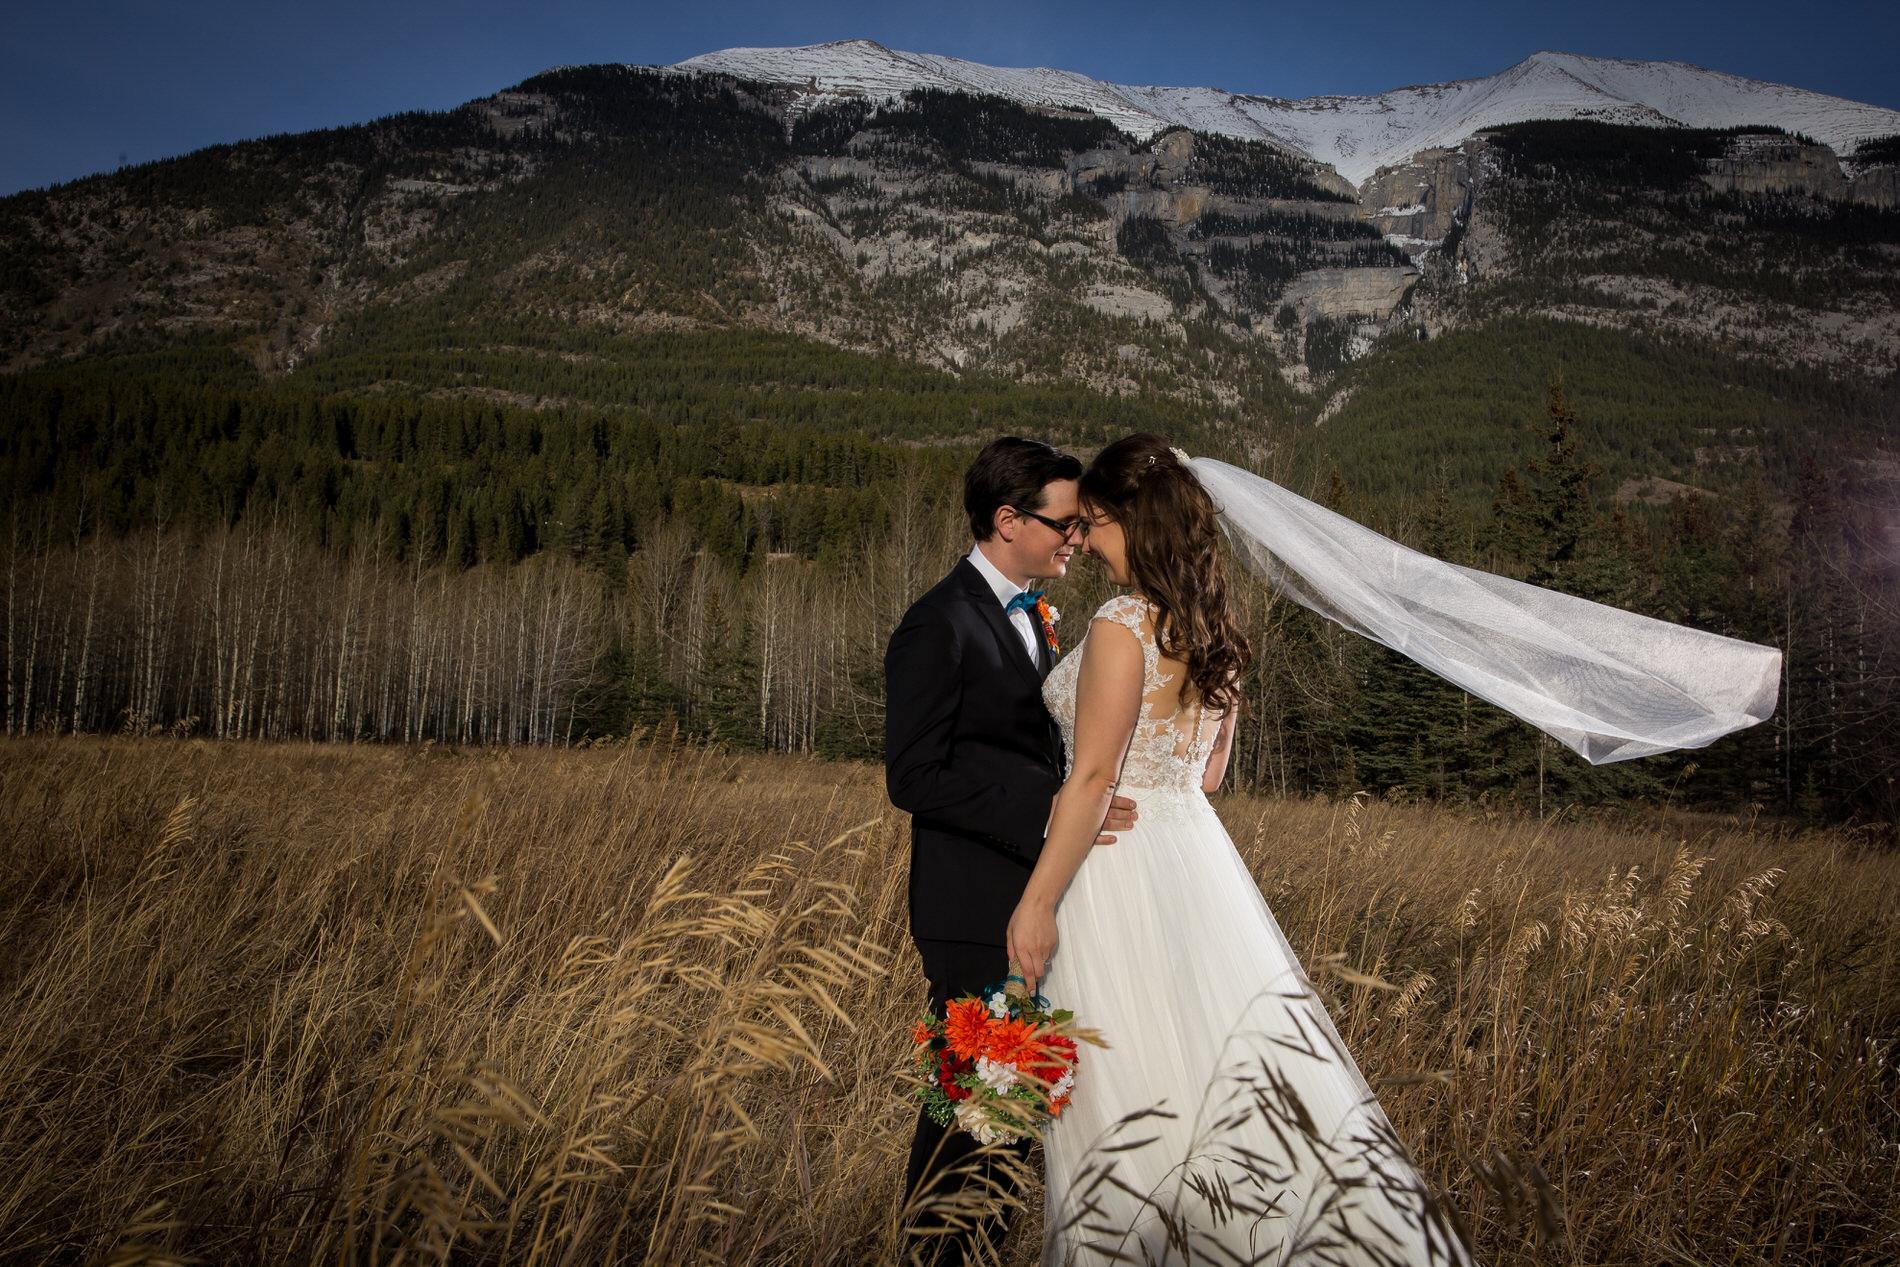 Kira and John Wedding-Brianna-030.jpg